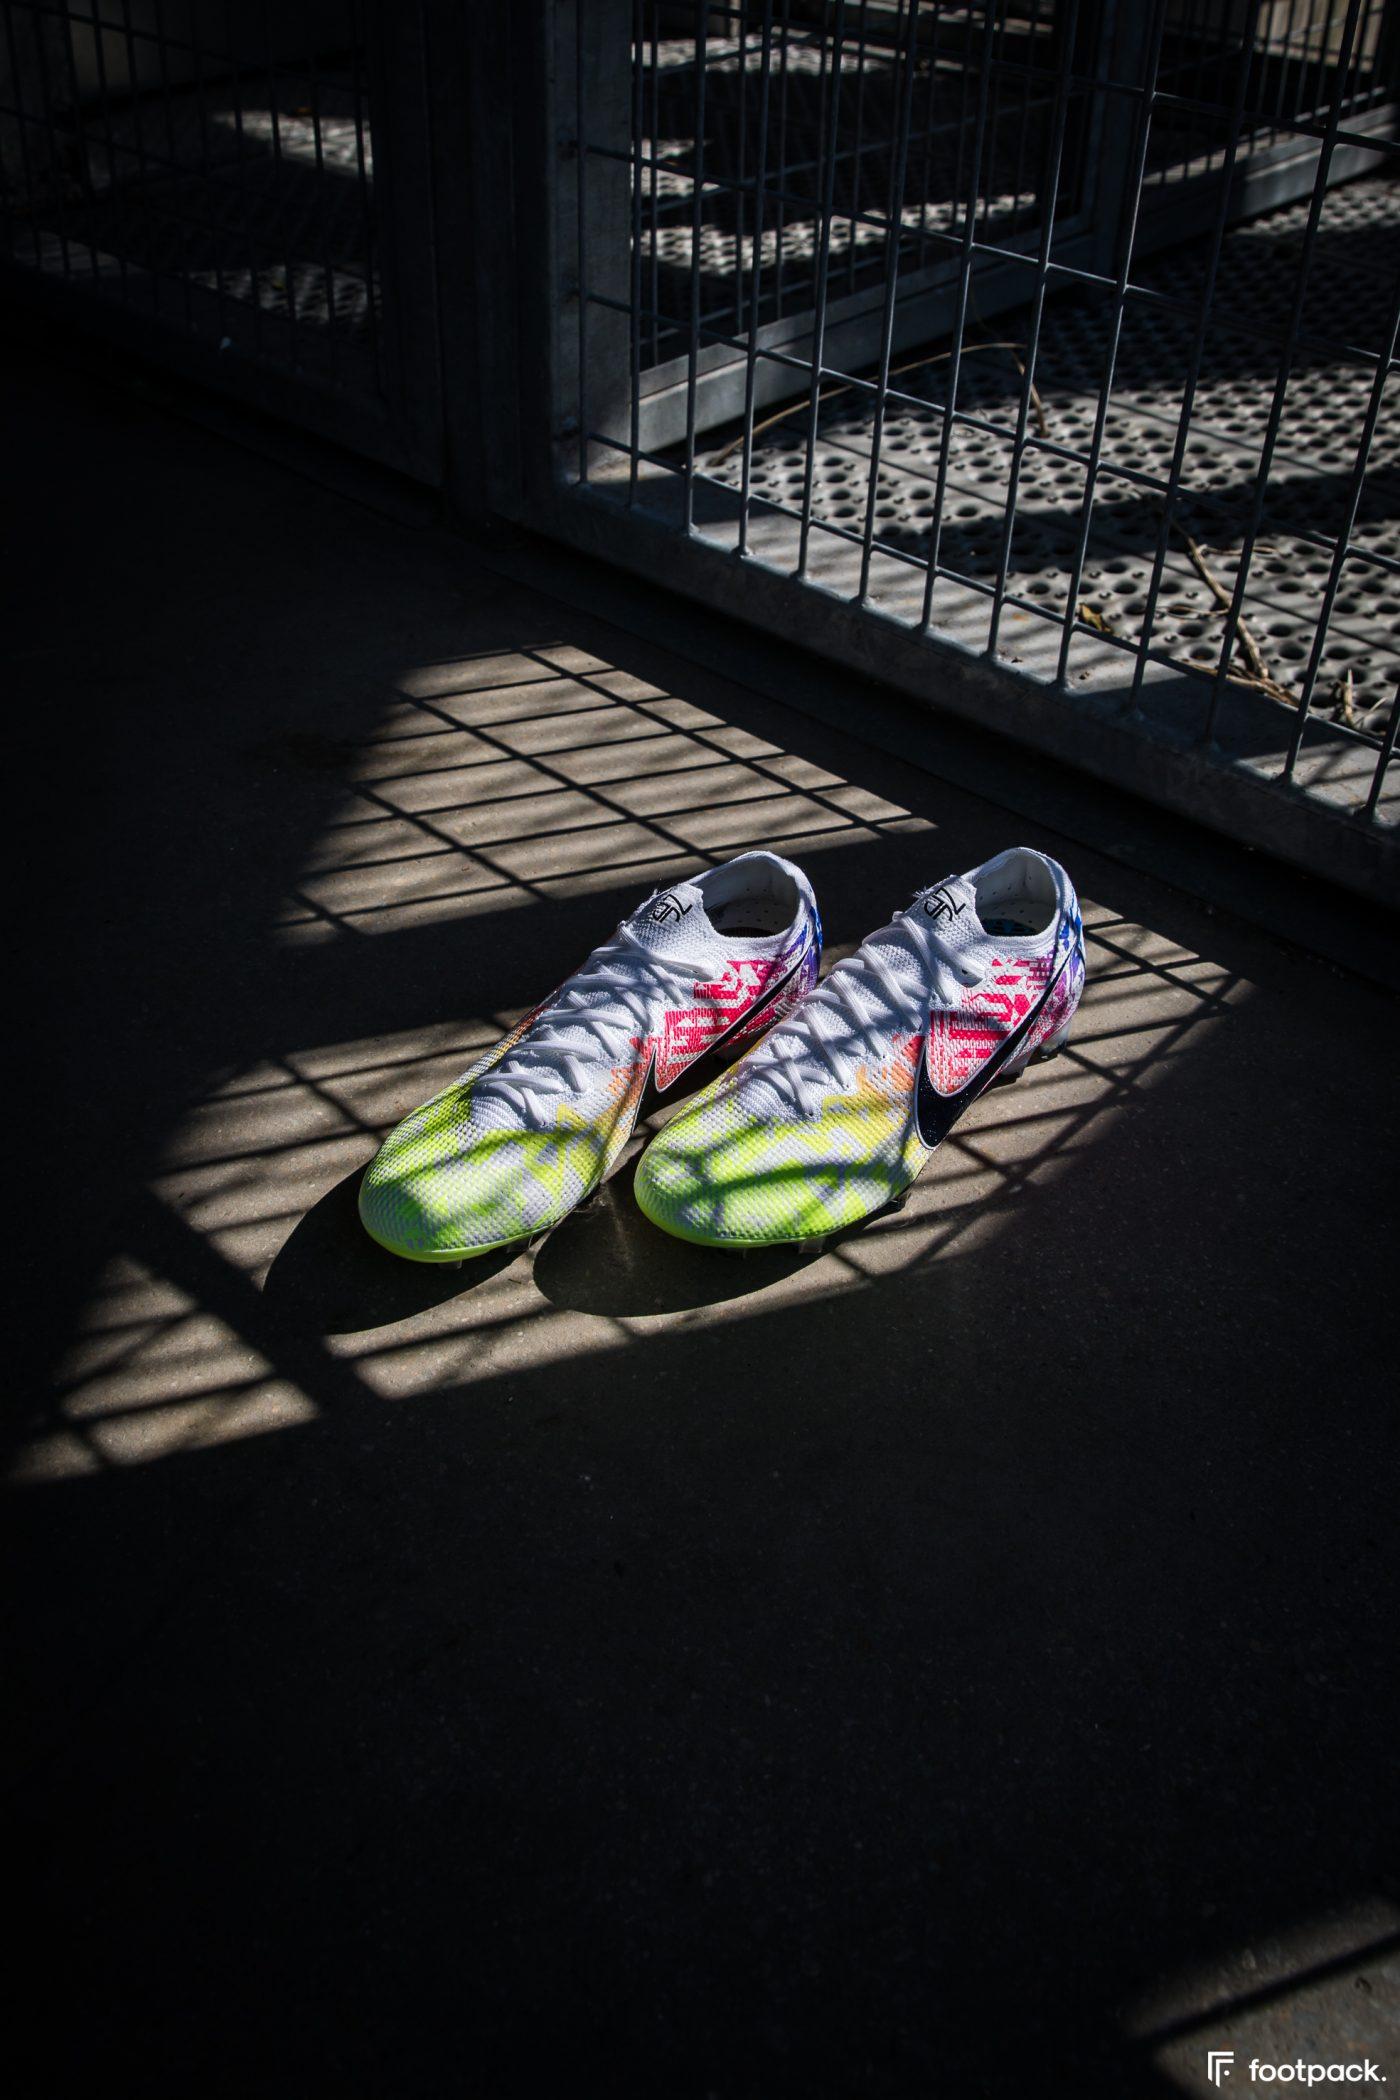 nike-mercurial-vapor-13-neymar-jogo-prismatico-footpack-2